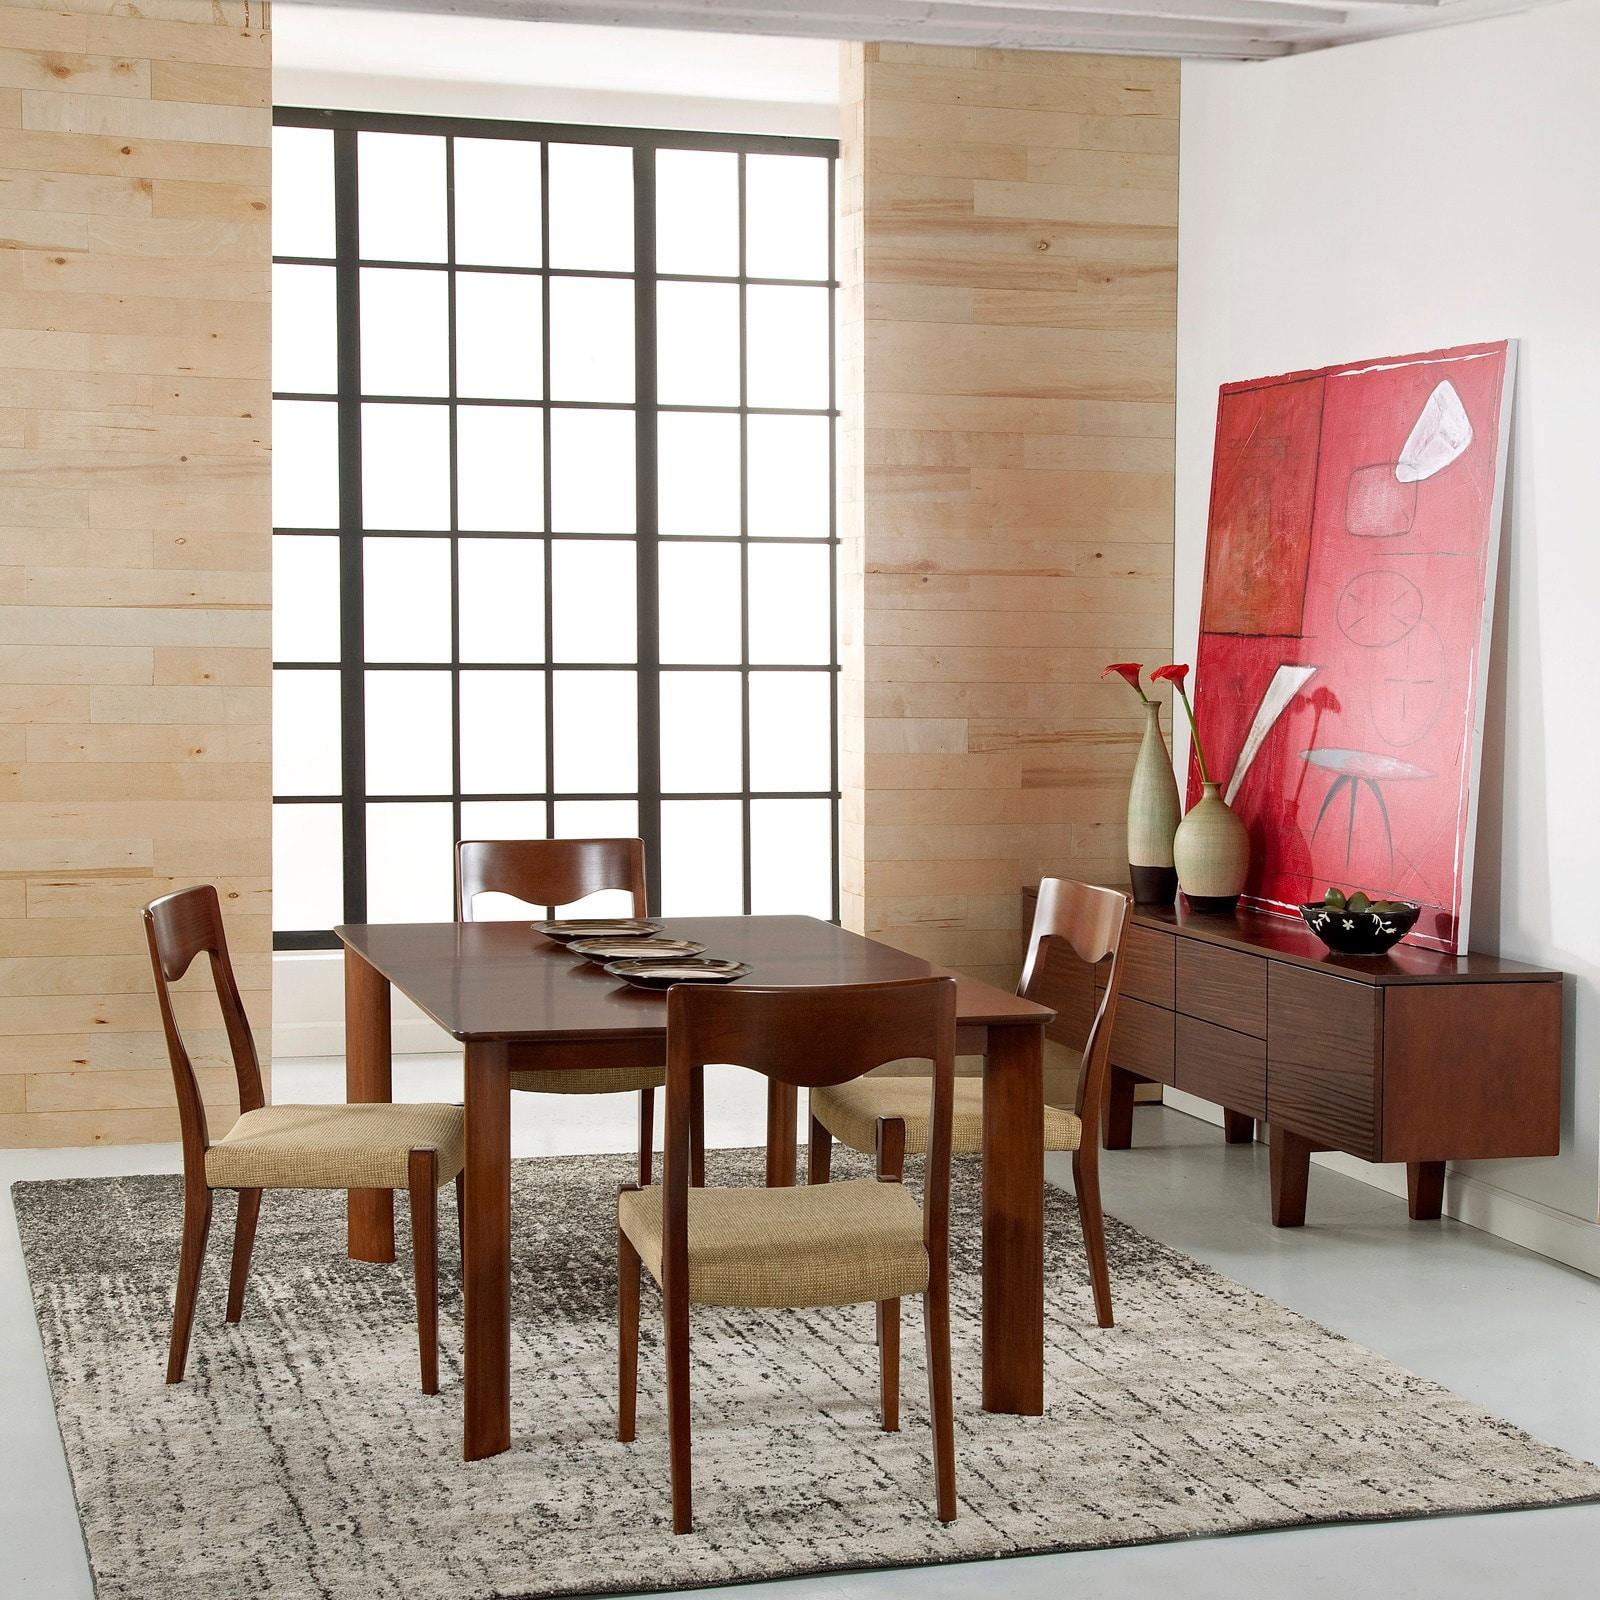 Shop saloom ari 36 x 72 rectangular maple smooth top custom dining table in walnut finish free shipping today overstock com 11518013